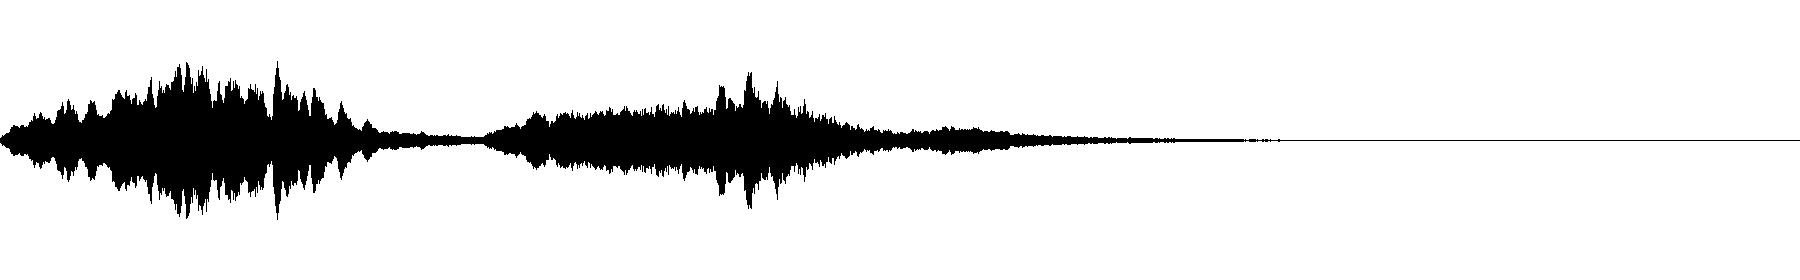 string flute dance melody 125bpm